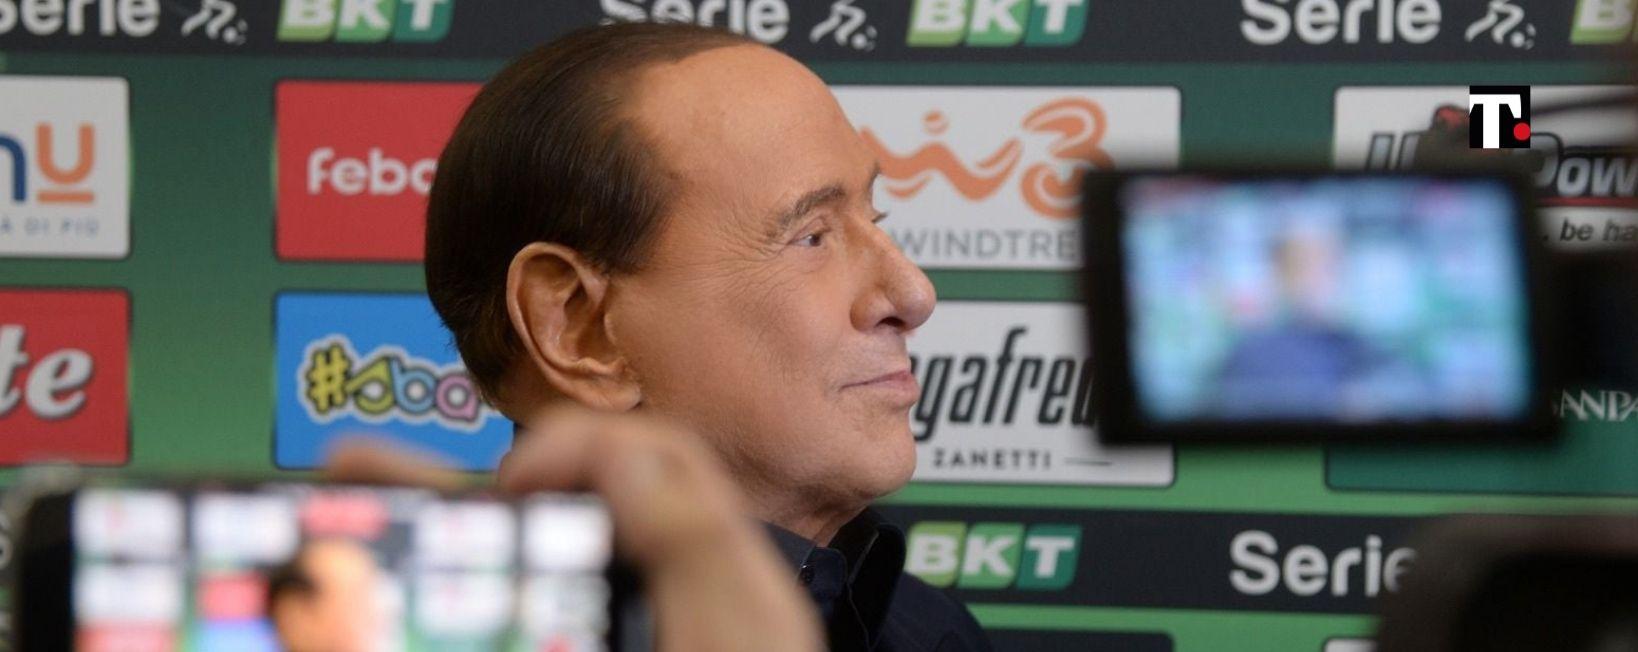 Silvio Berlusconi patrimonio